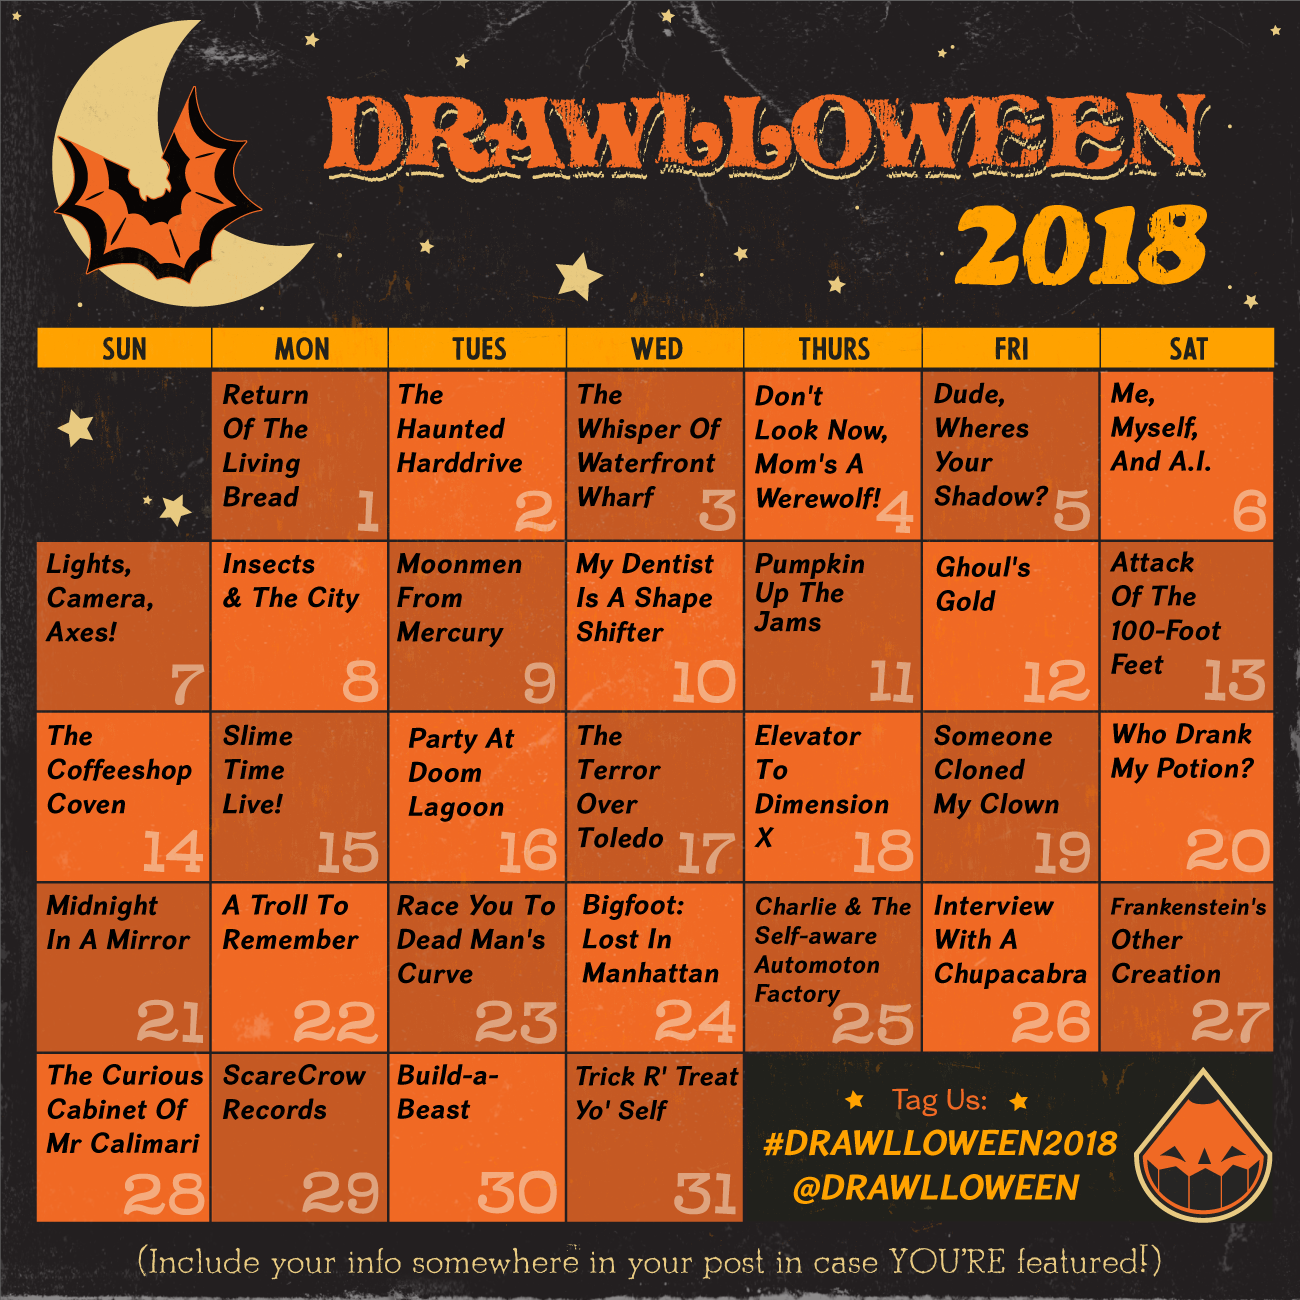 #Drawlloween2018 Calendar